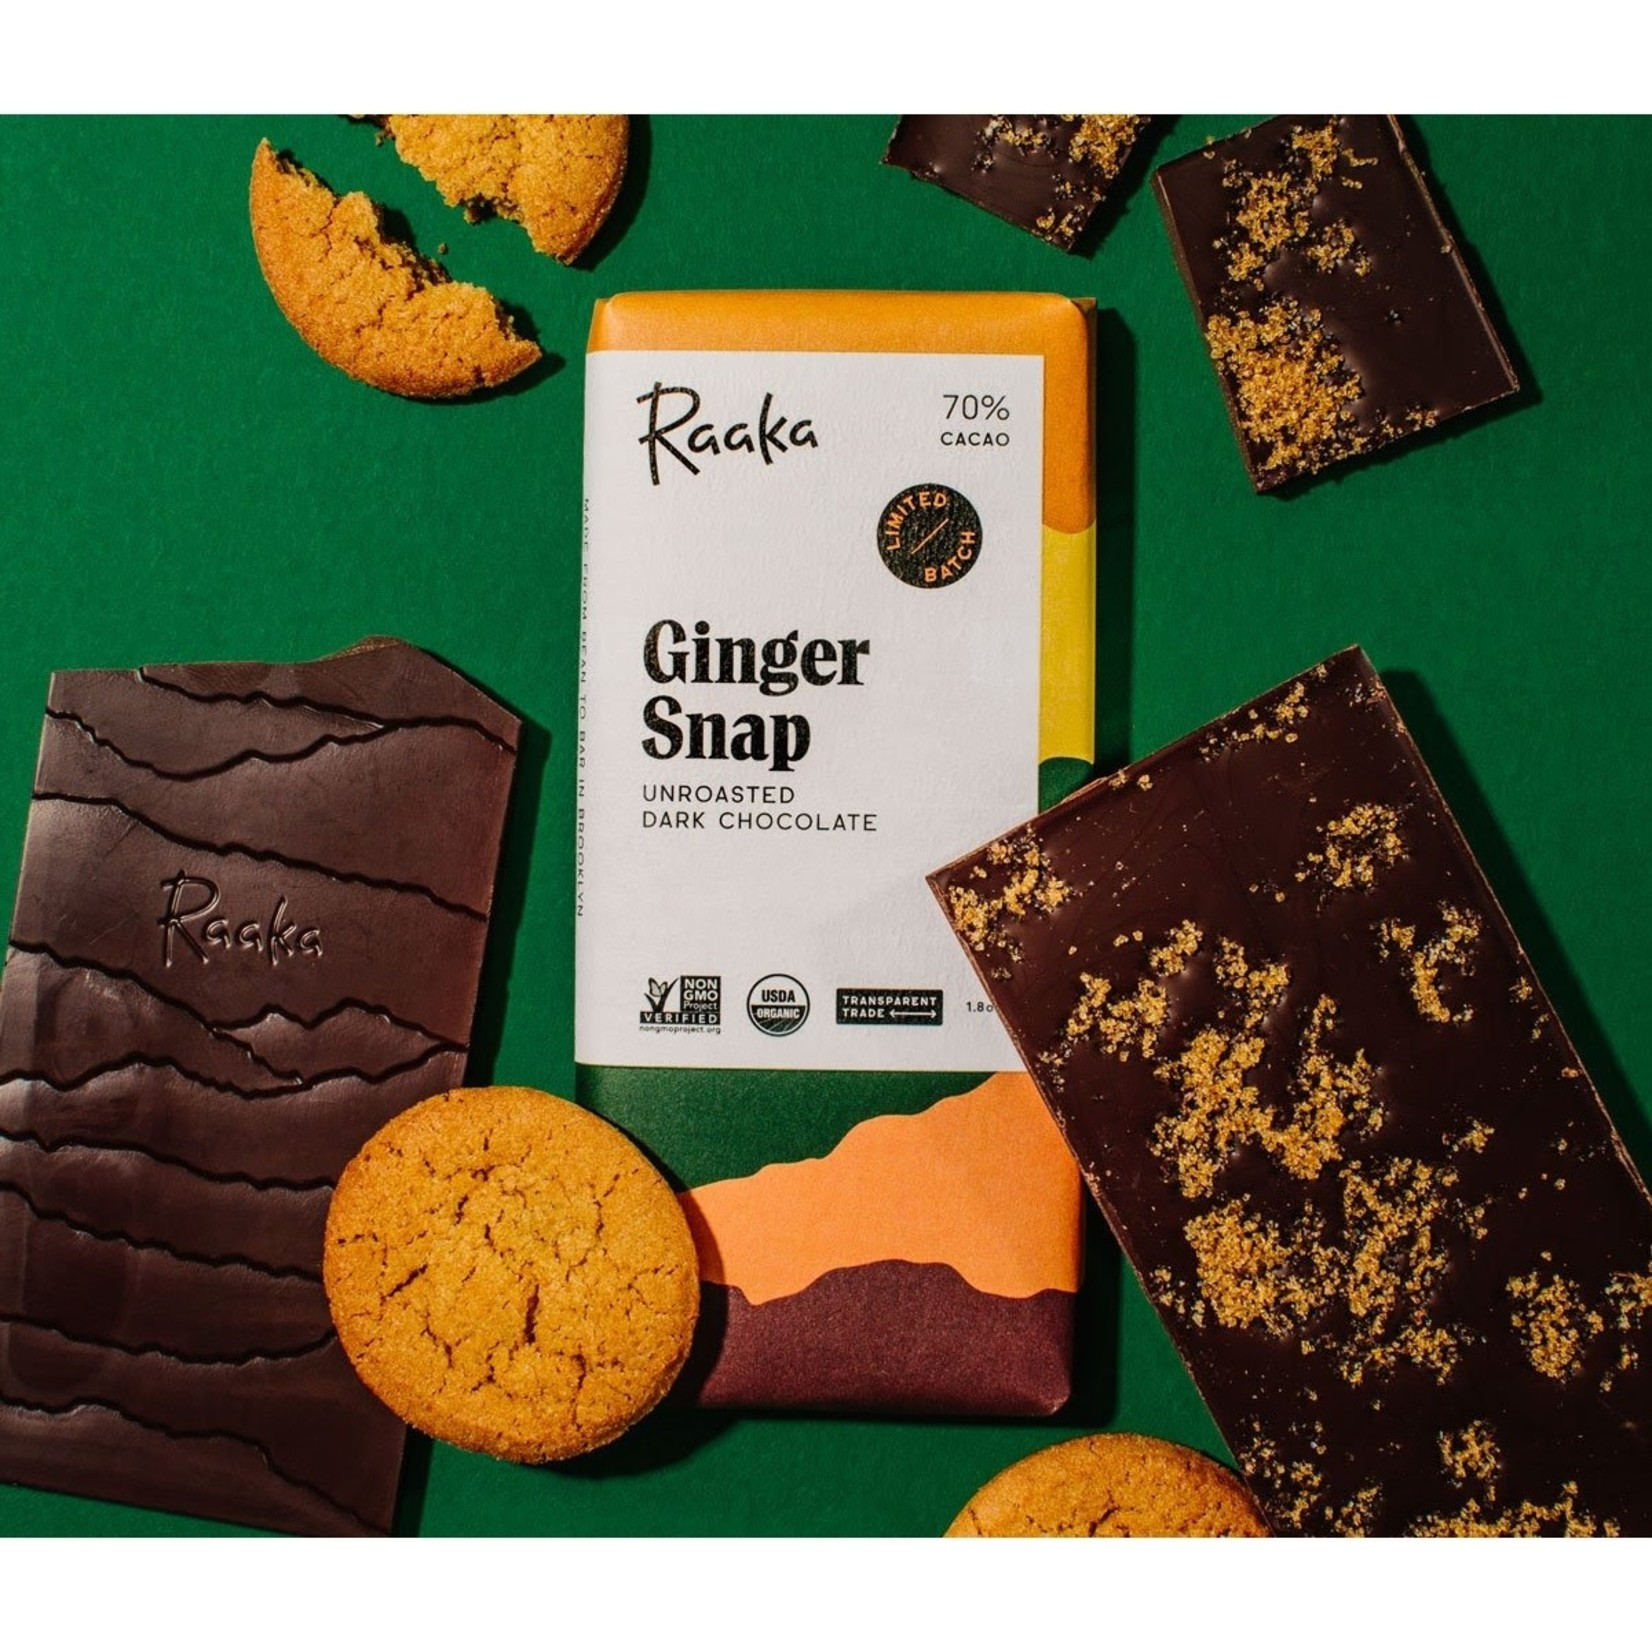 Raaka Raaka Ginger Snap Chocolate Bar 70% Cacao - Limited Batch